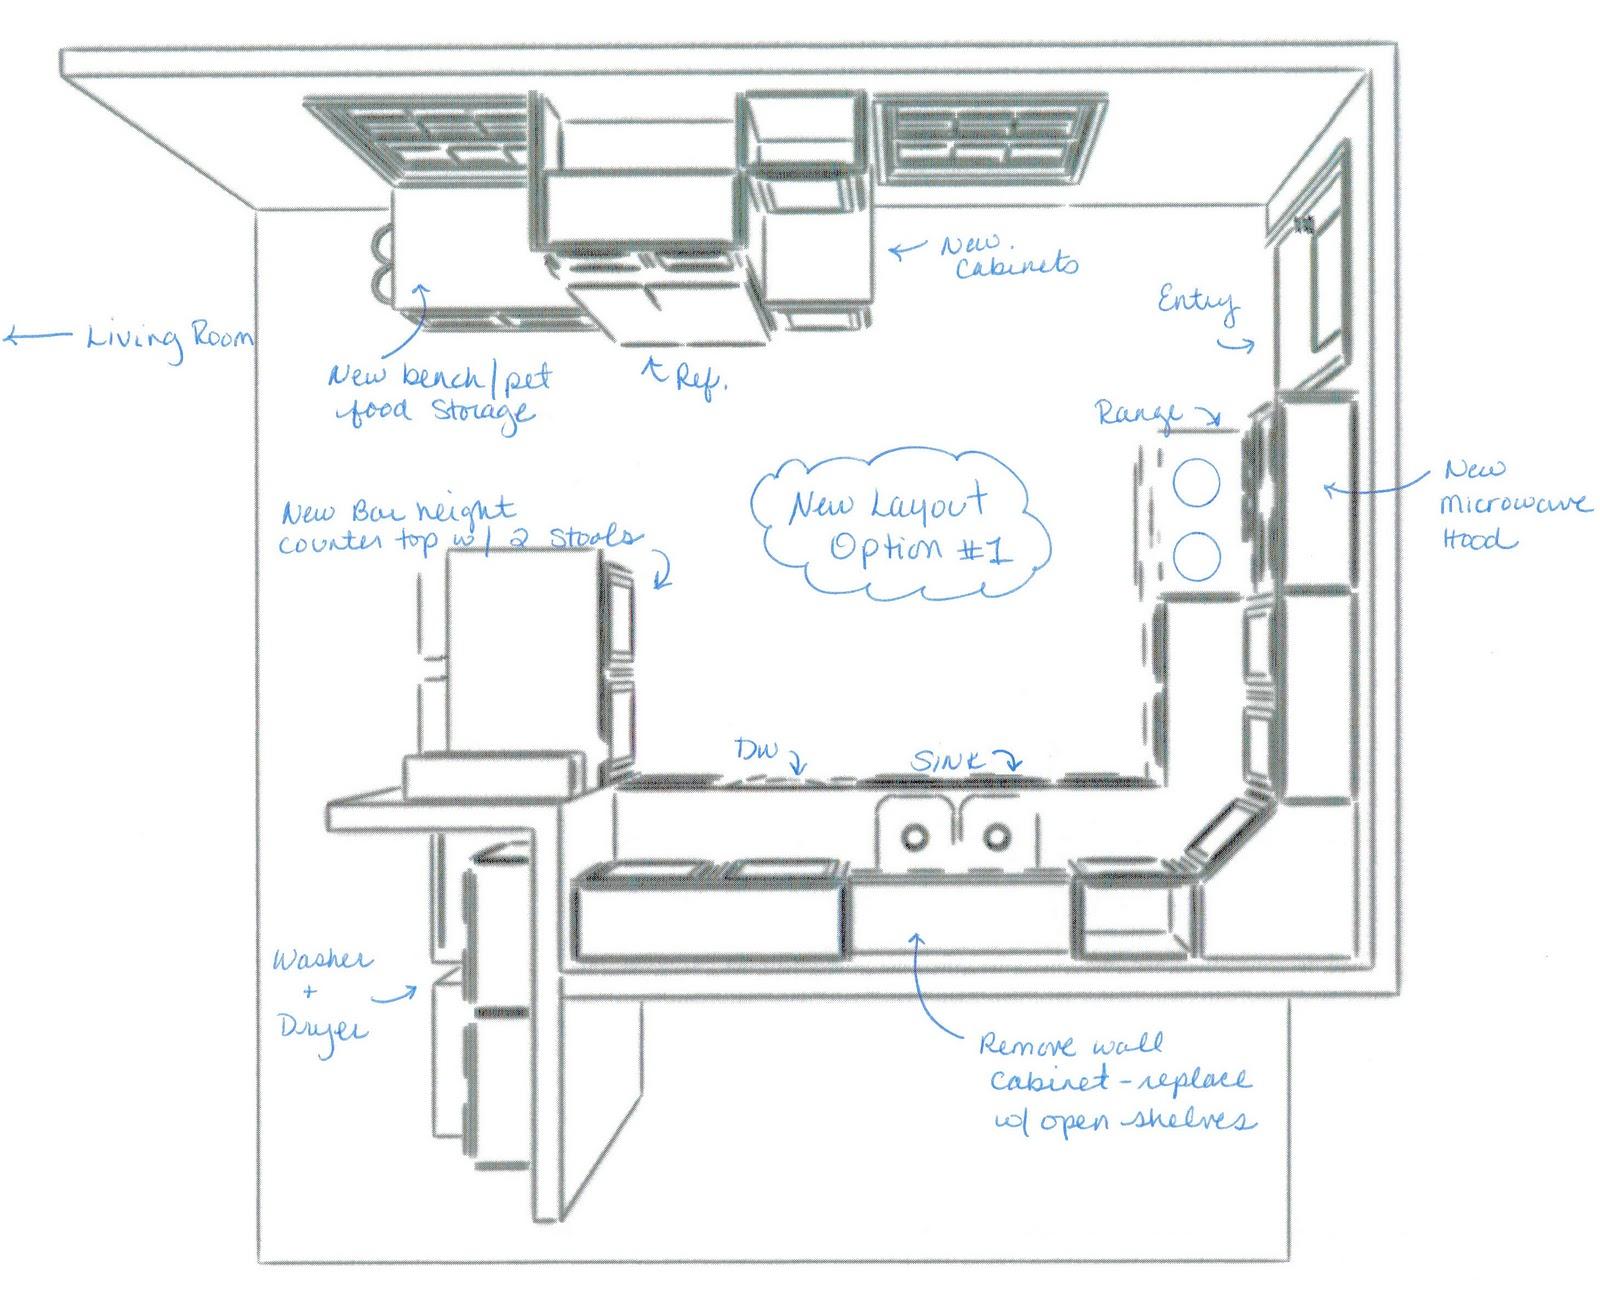 new kitchen layout option %25231